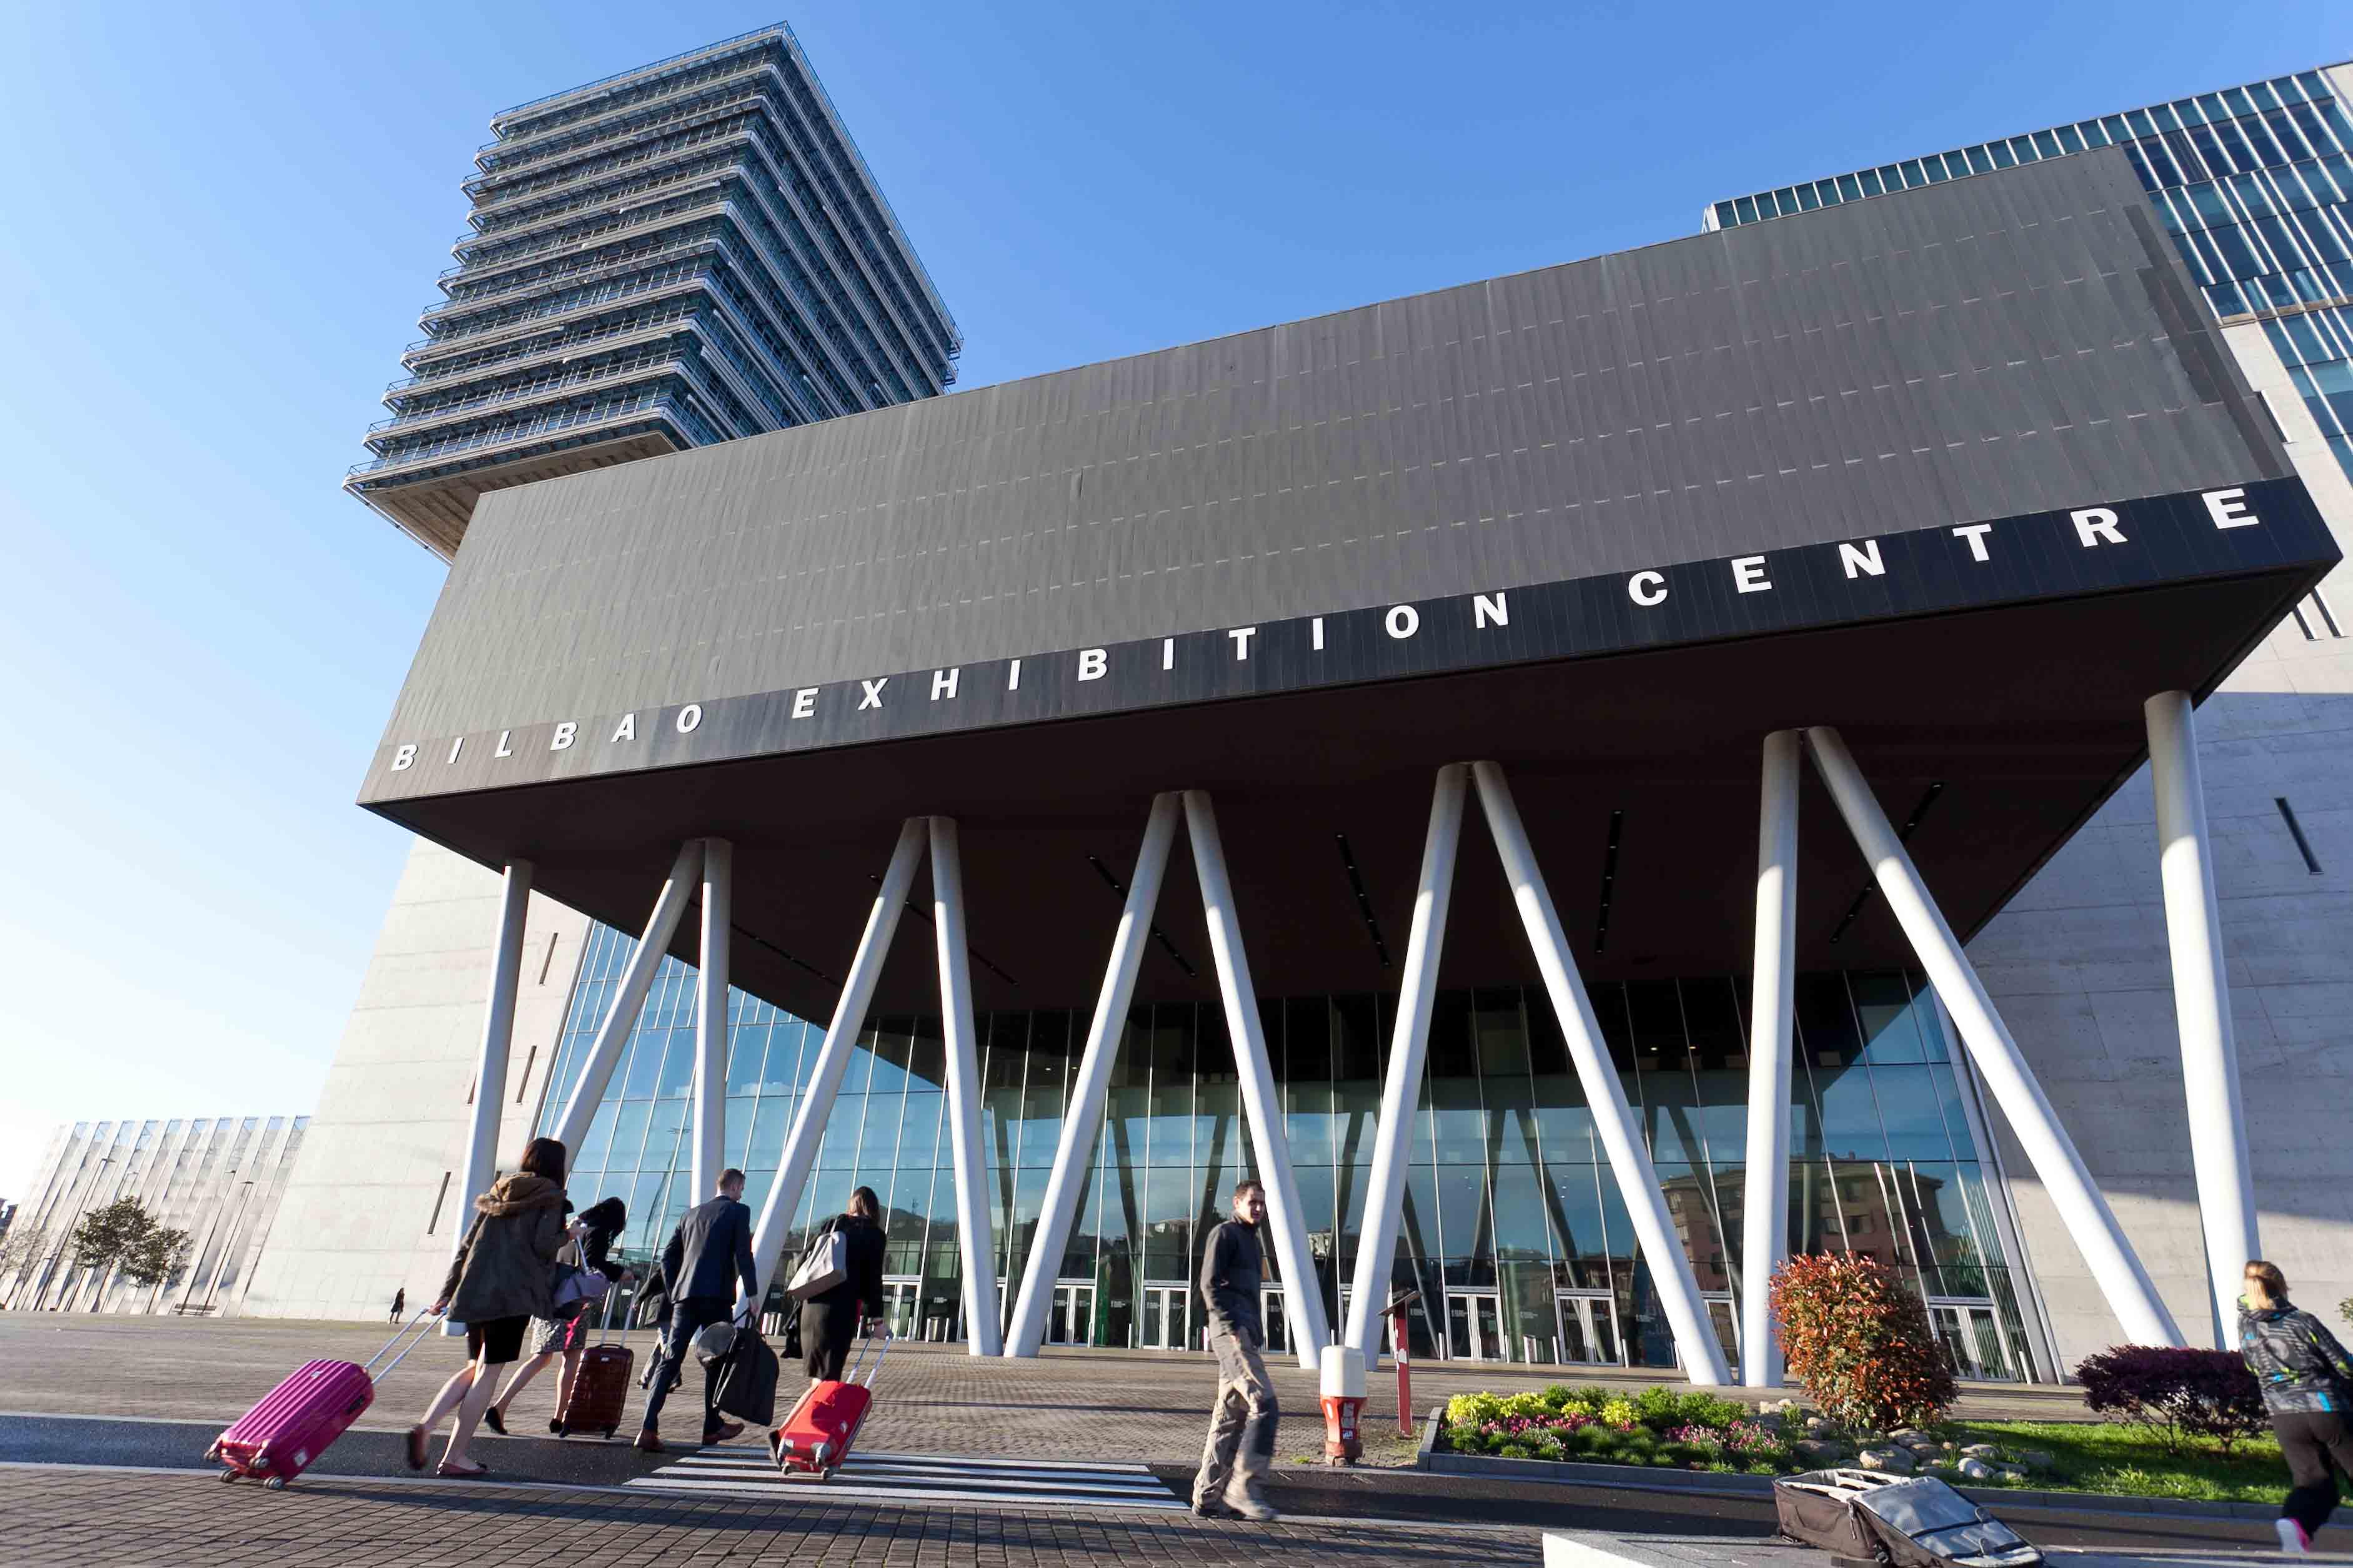 Bilbao centre